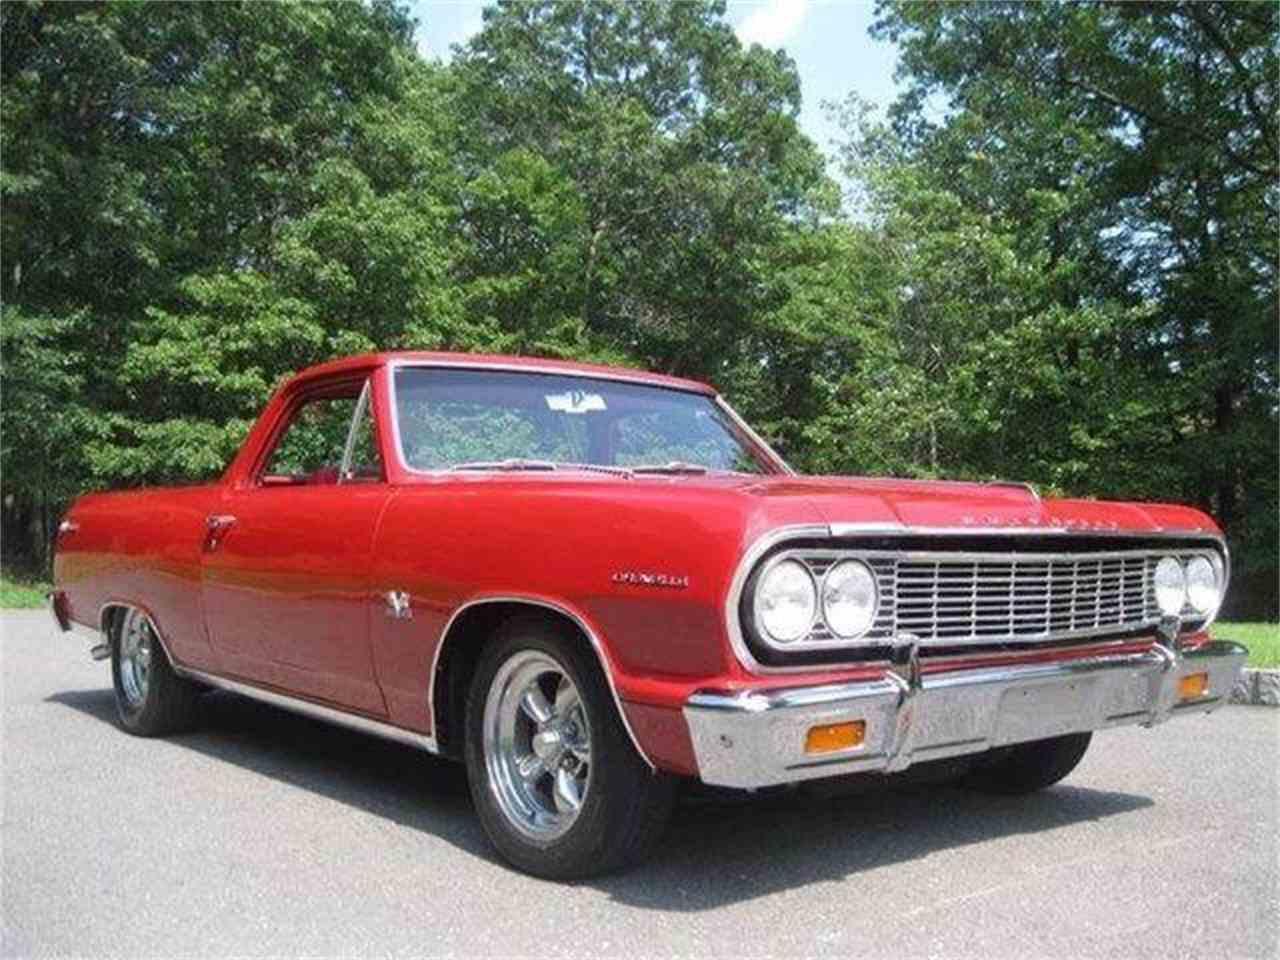 1964 Chevrolet El Camino for Sale | ClassicCars.com | CC-1055421